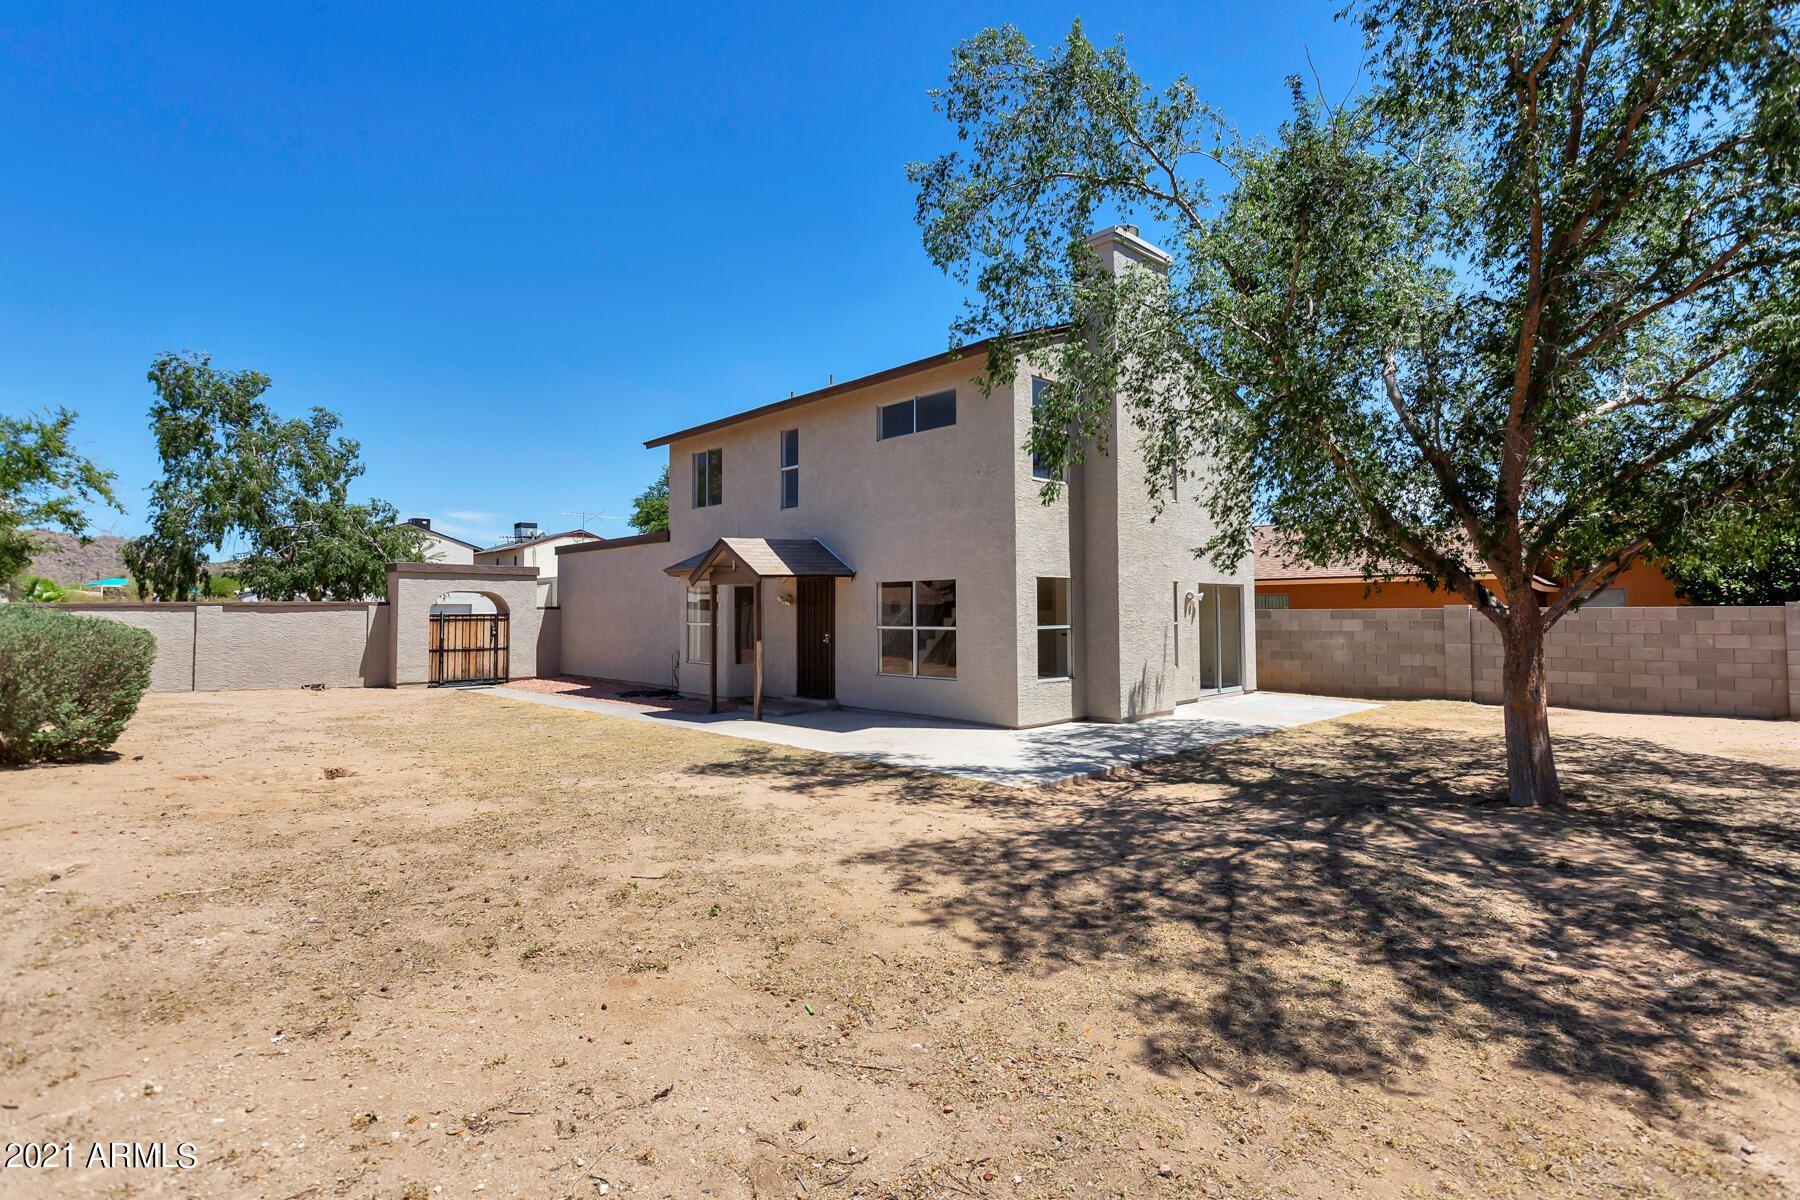 19208 N 15TH Place, Phoenix, AZ 85024 - MLS#: 6240084